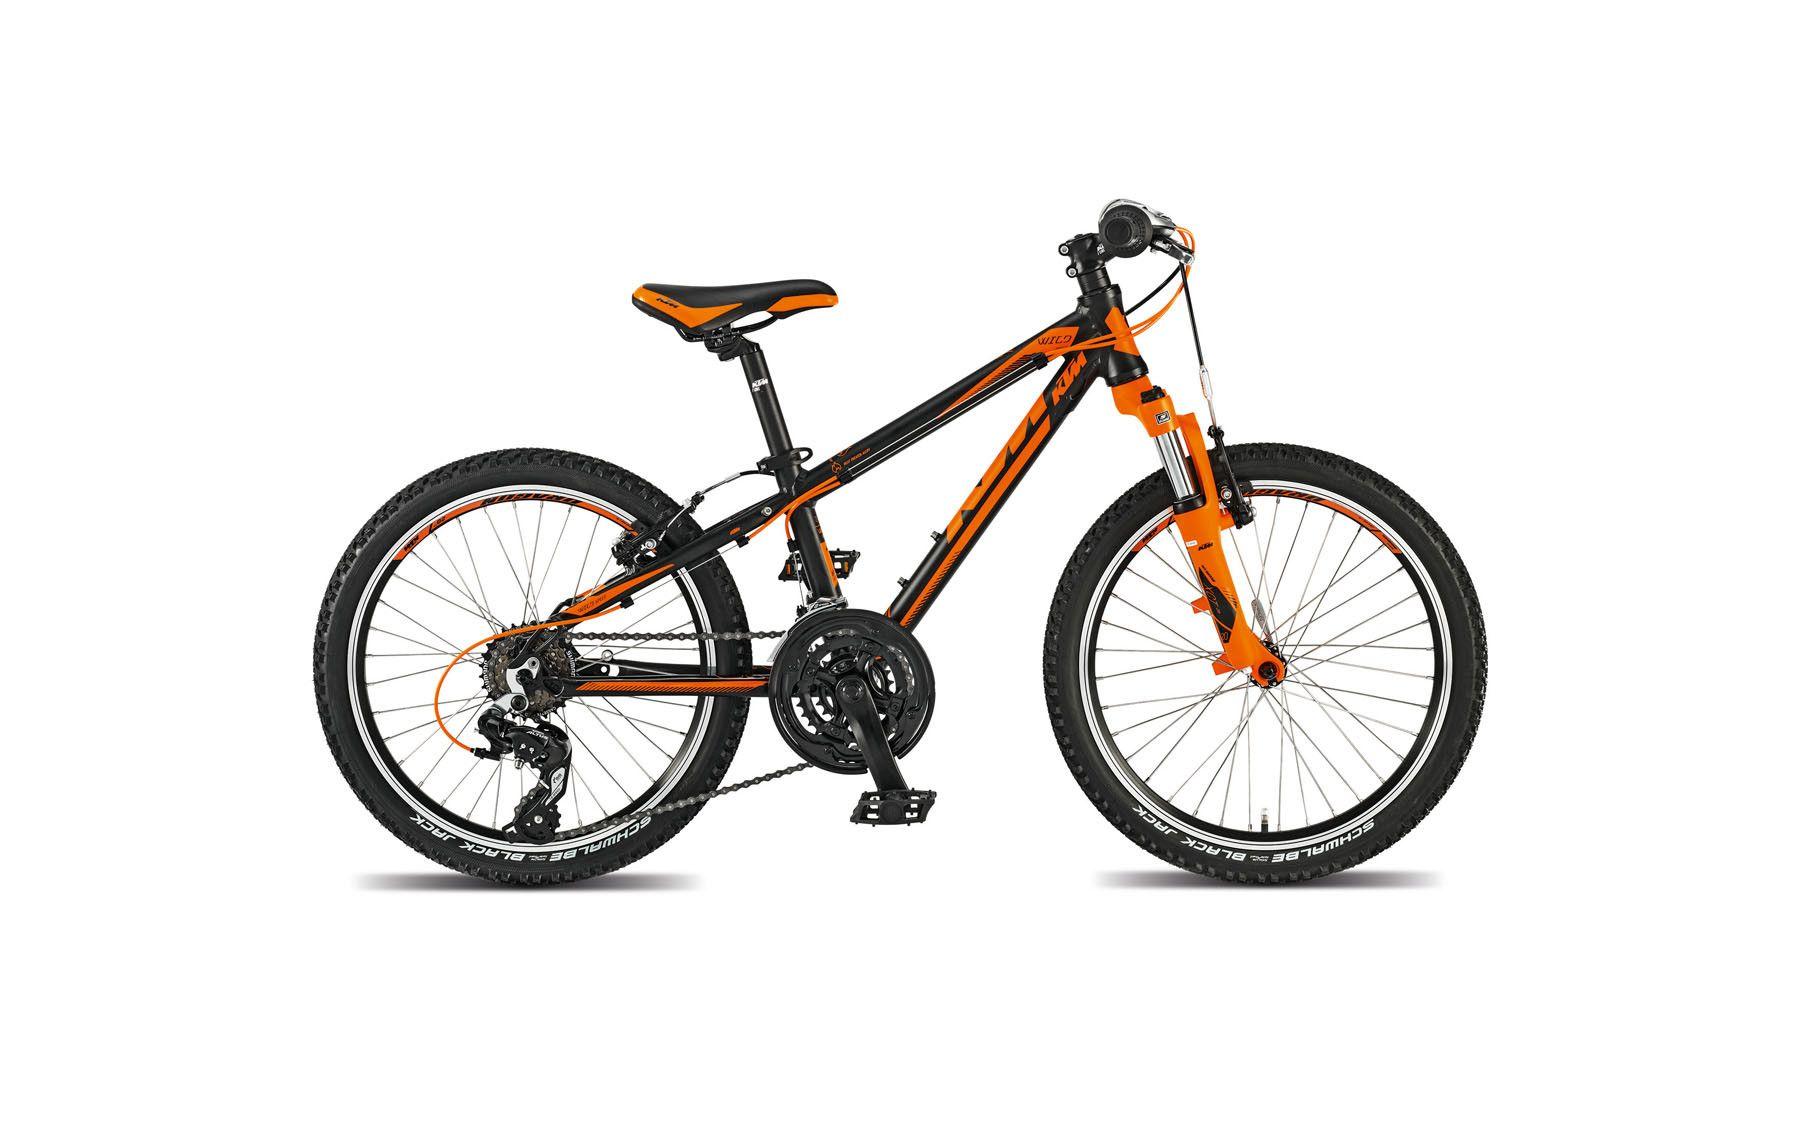 8 Bicicletta Ktm Wild Speed 20 21v Biciclette Bambino Ktm Shop Online